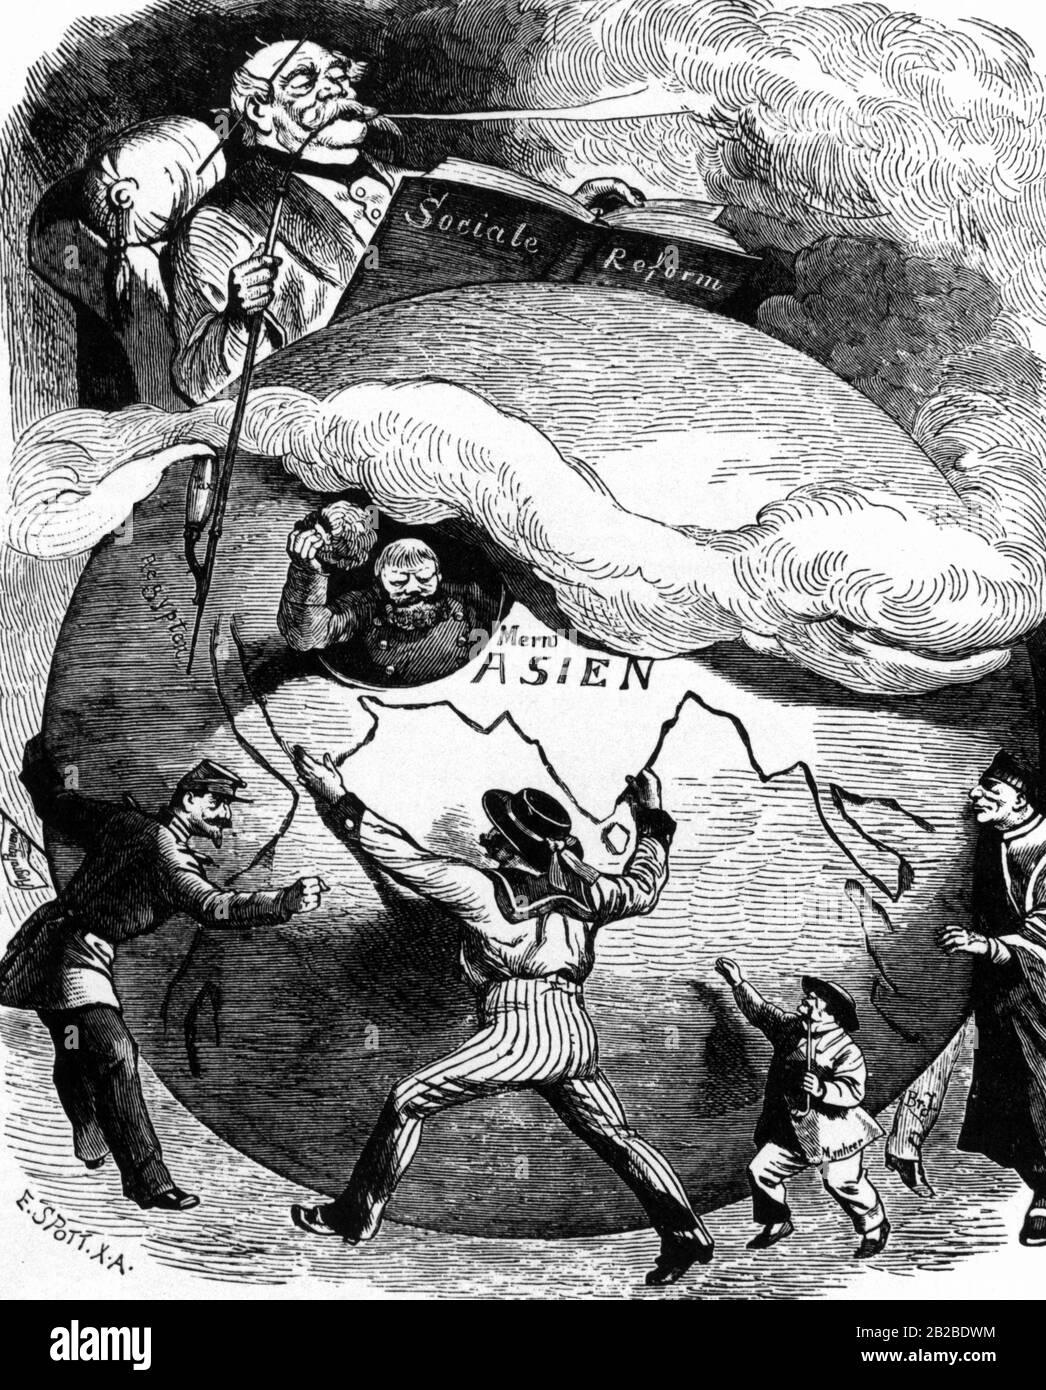 Bismarck Welfare State